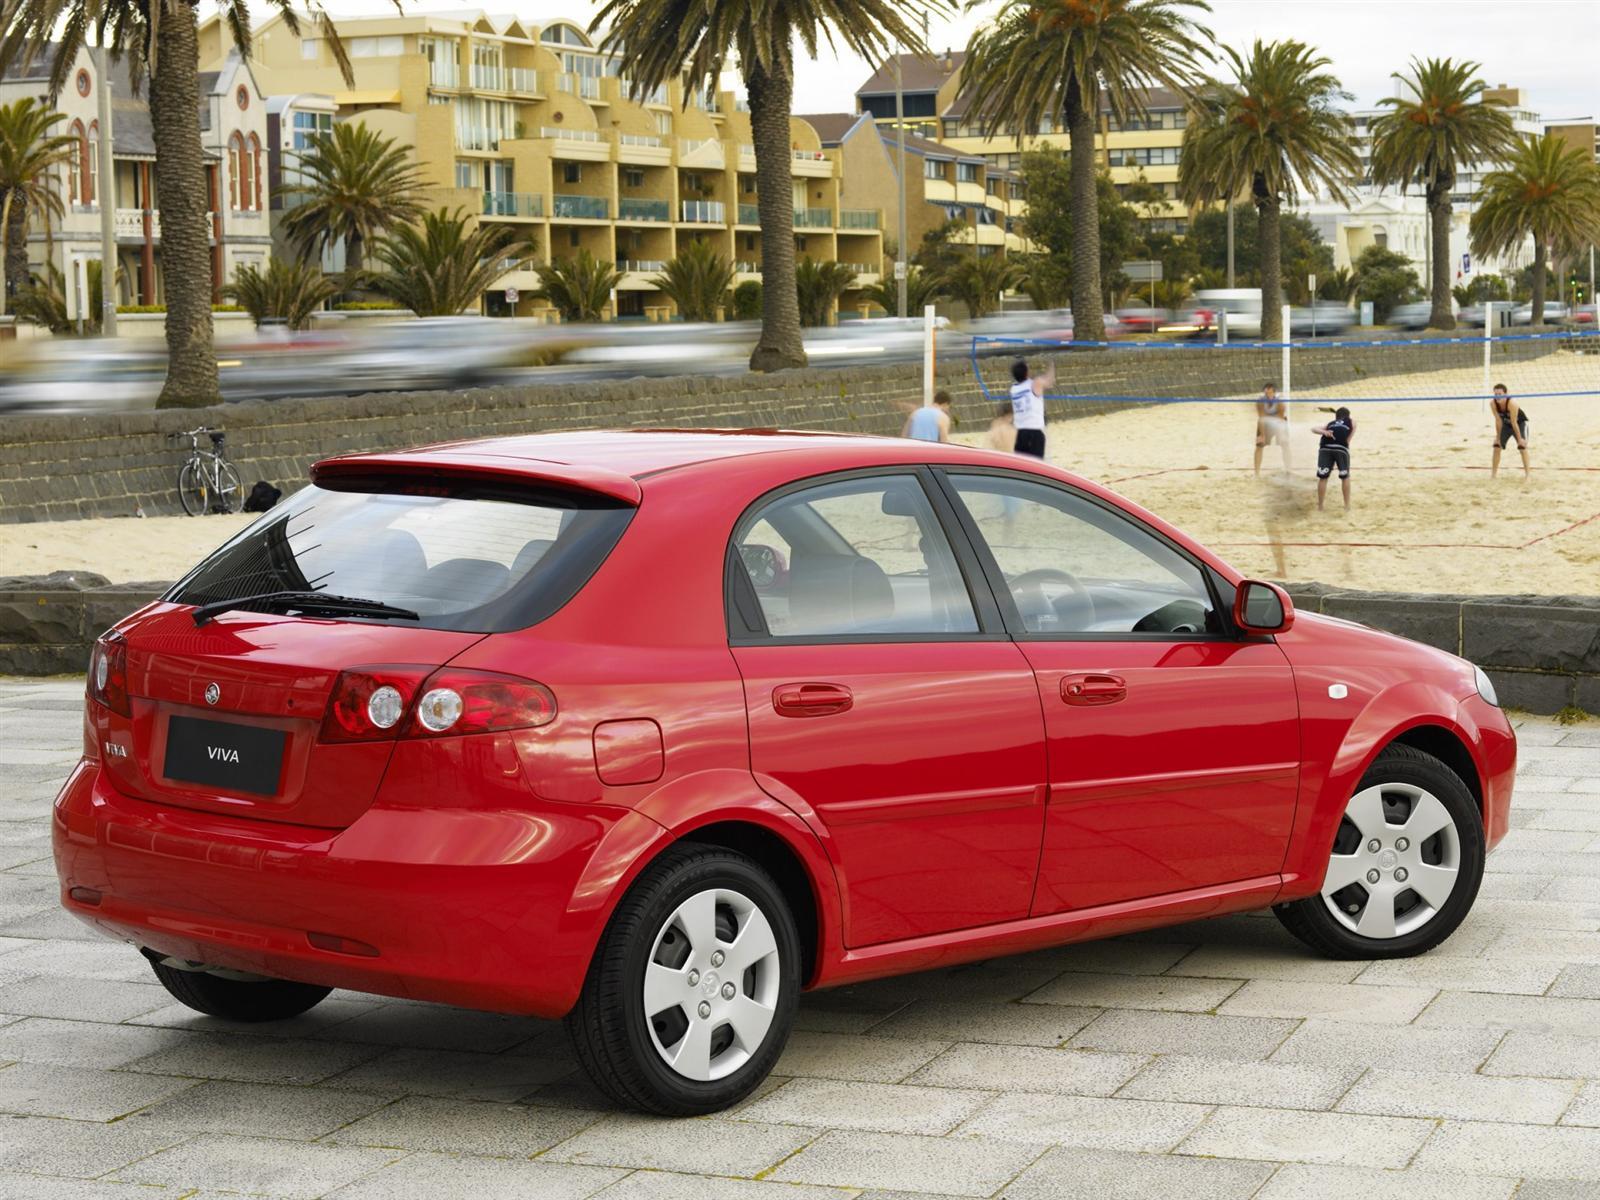 2009 Holden Viva Image. https://www.conceptcarz.com/images ...